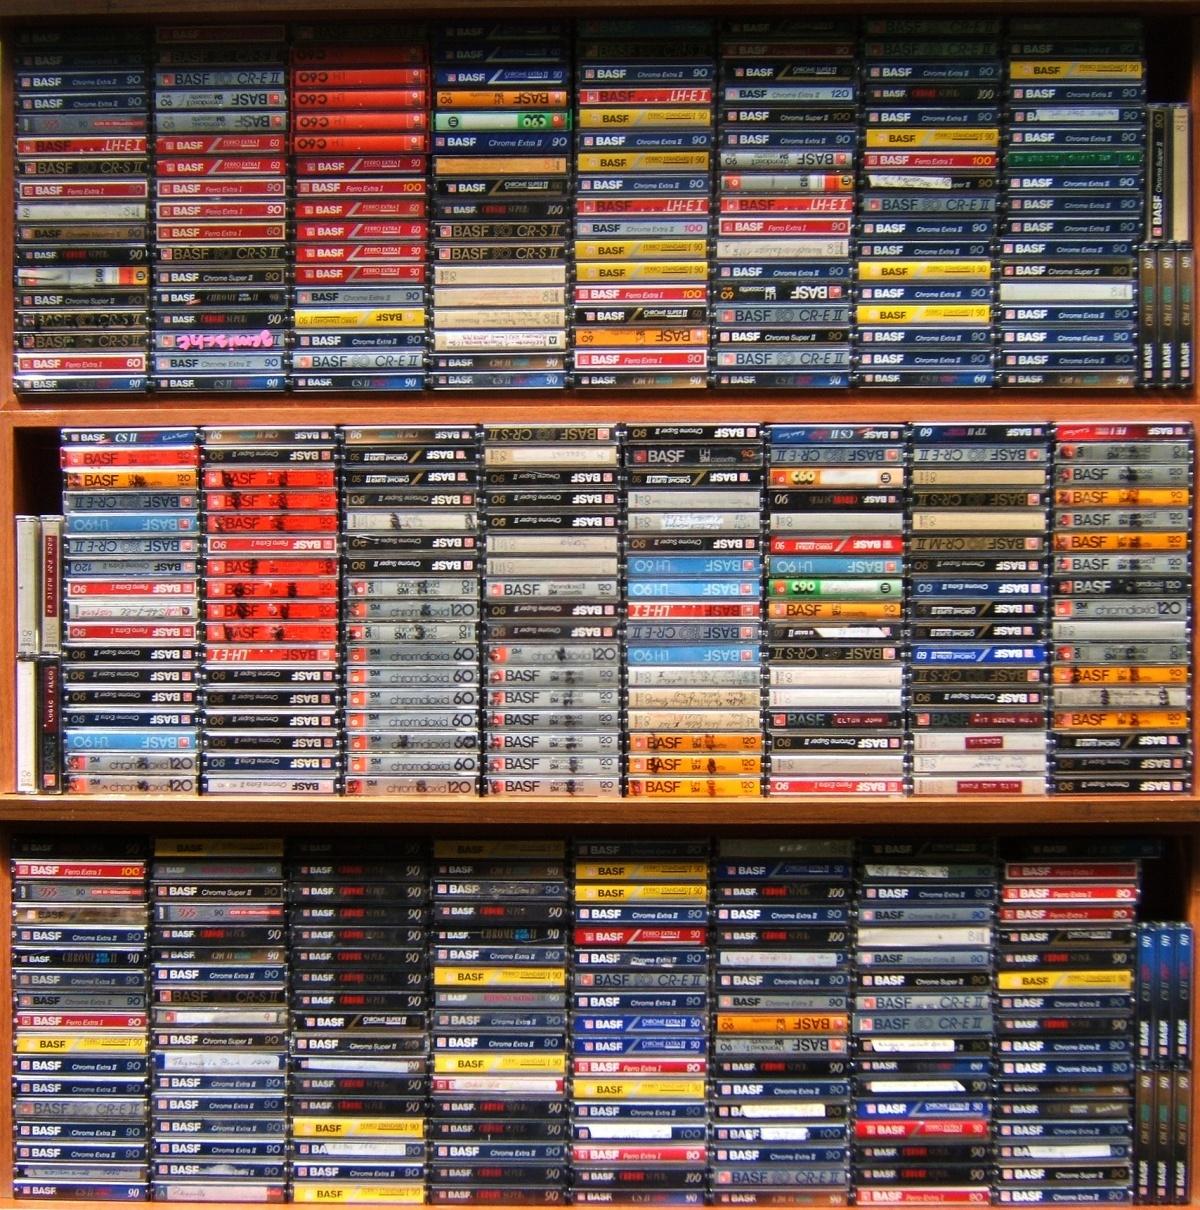 Flickr: cassettes